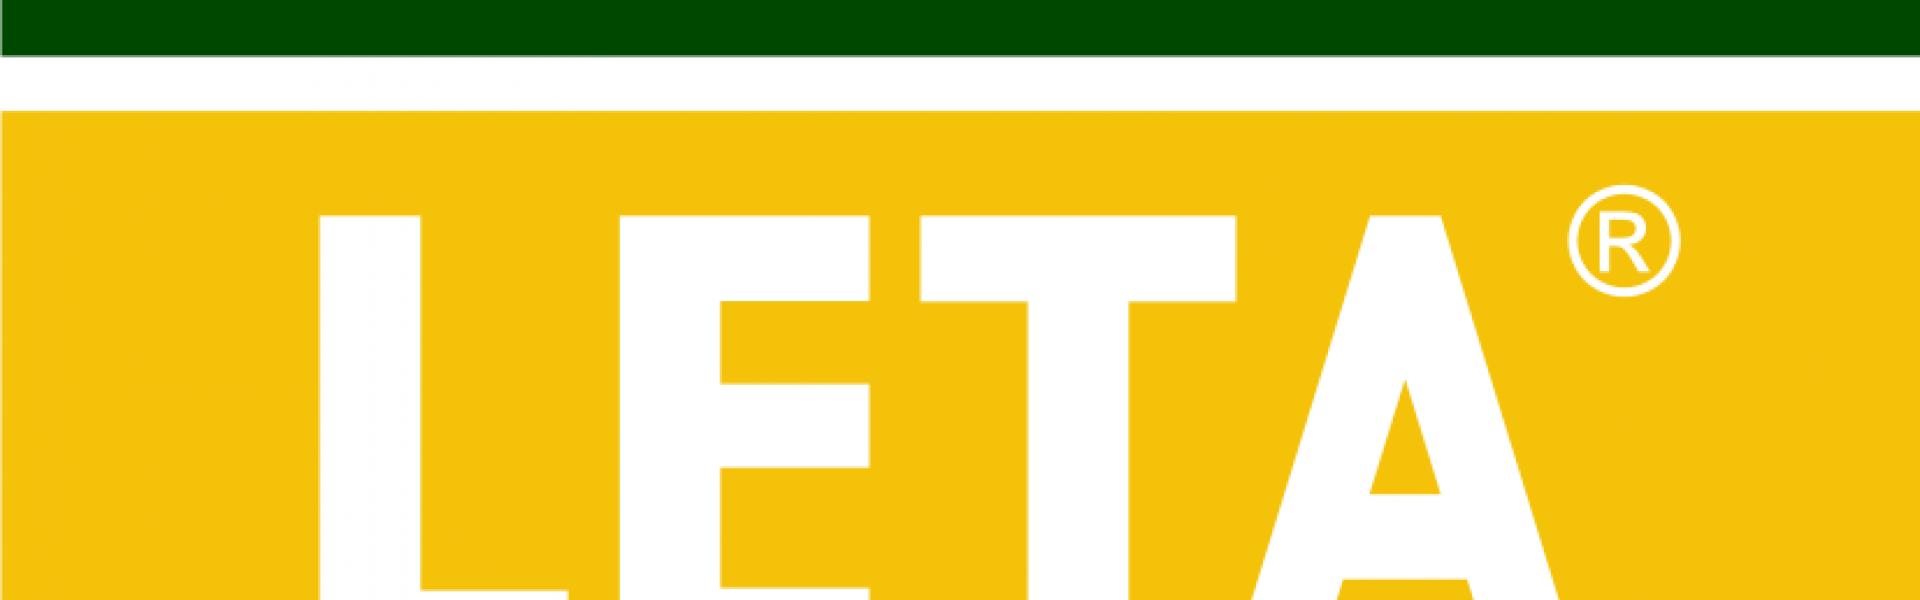 LETA English Language Training & Services GmbH cover